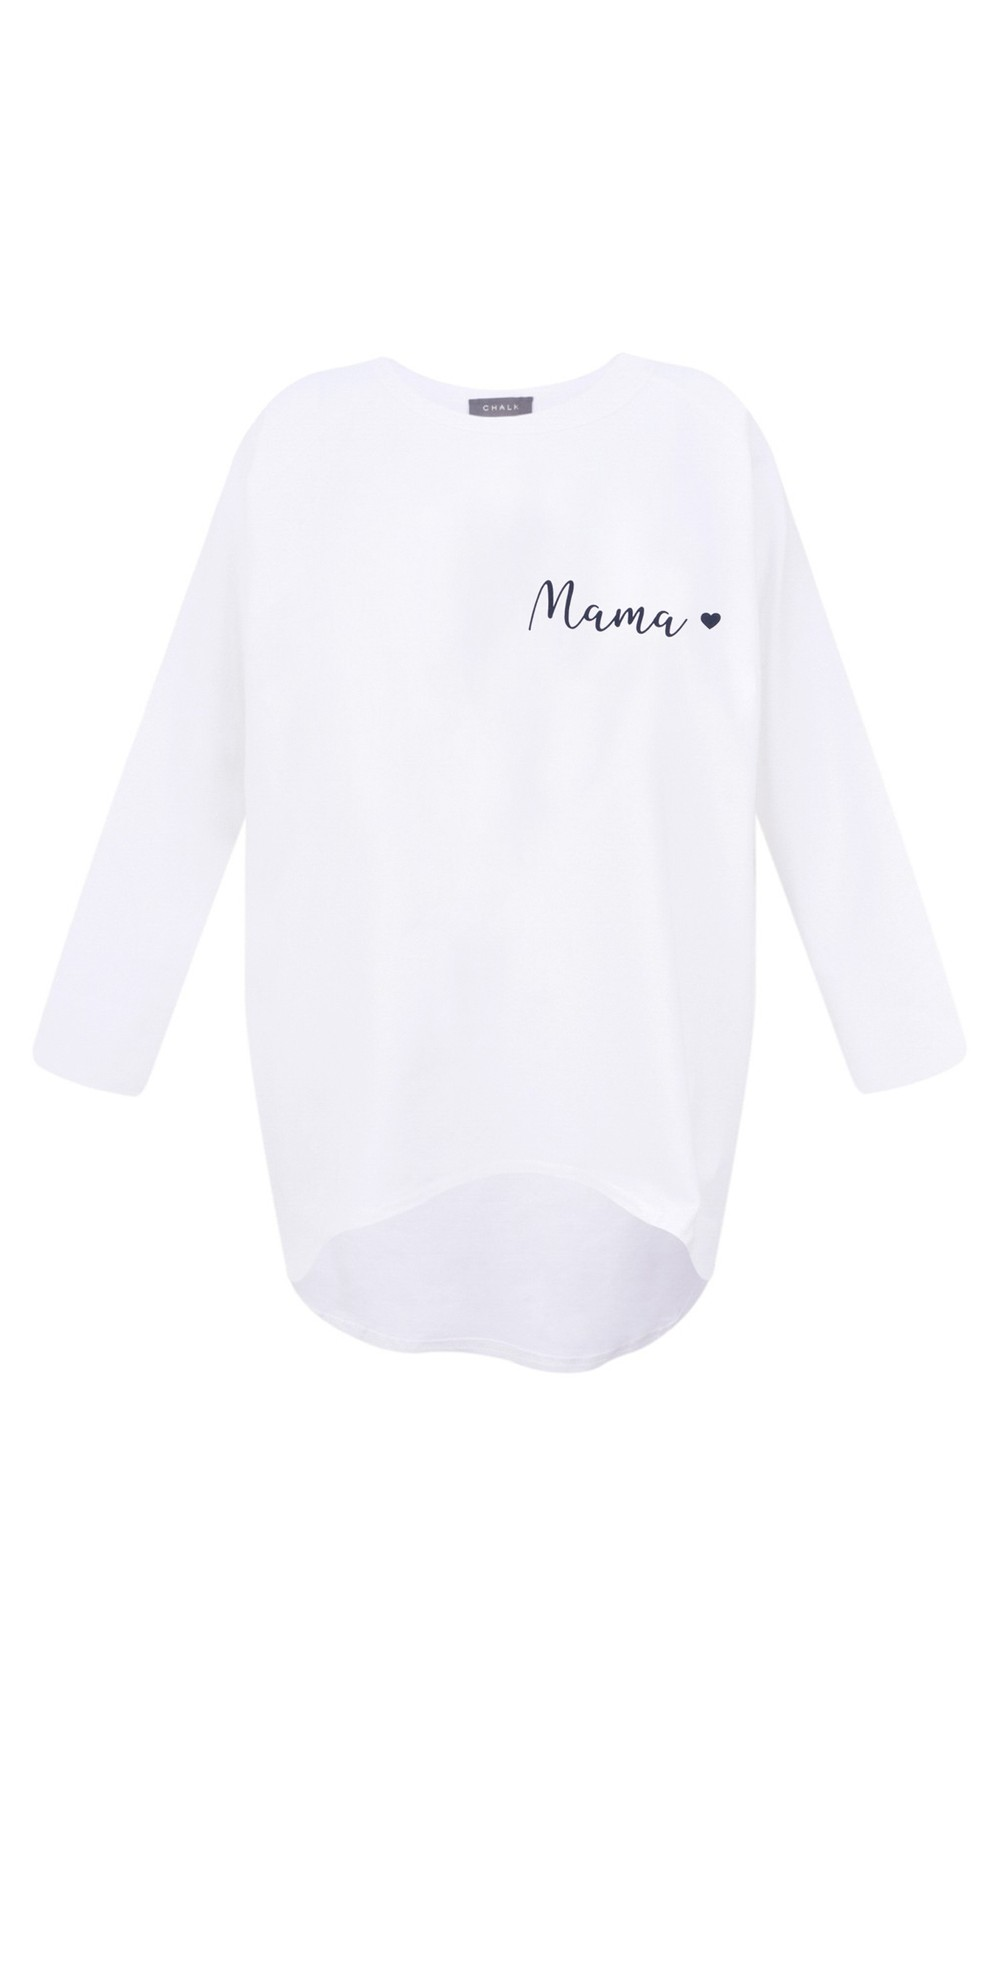 Robyn Mama Top - Gemini Exclusive! main image